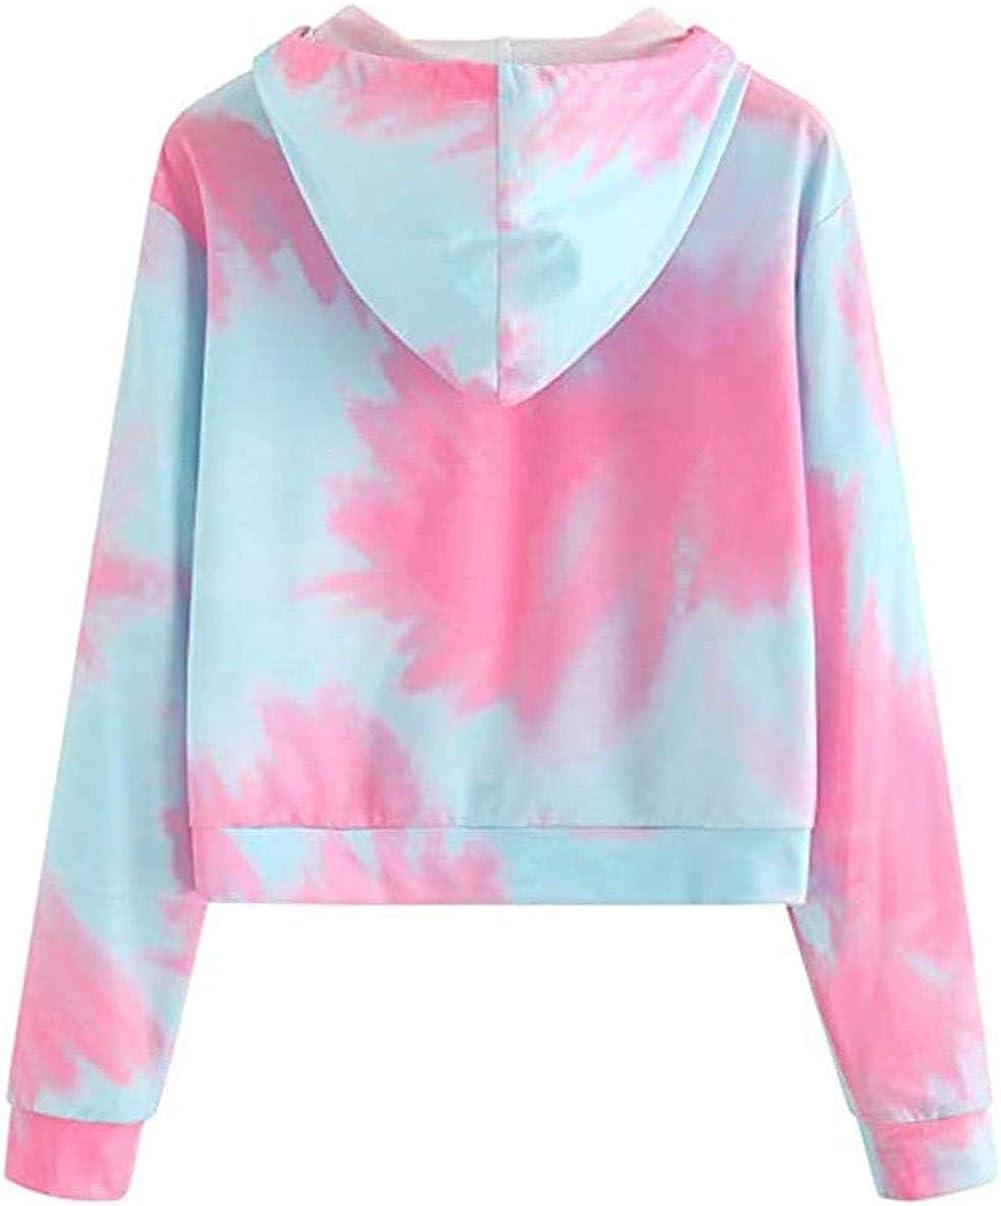 LET Mesdames Arc-en-Ciel Zipper à Capuche Dames Couture Zipper rayé Pull Sweat Top B-pink